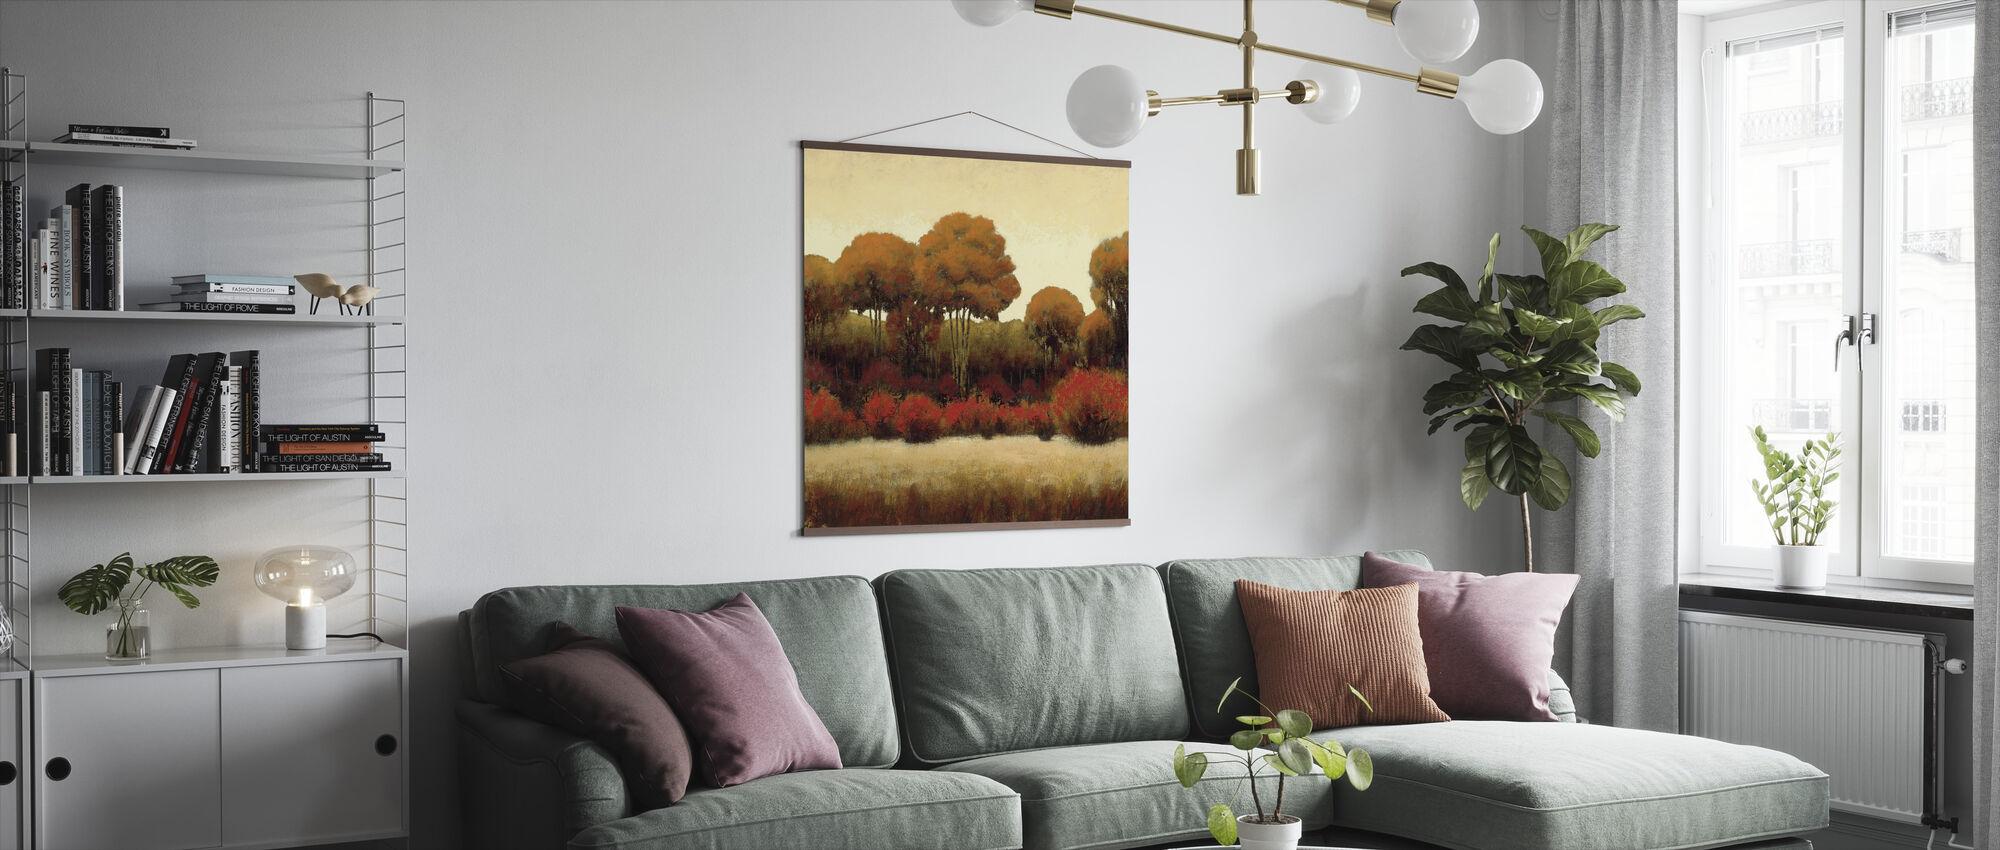 Syksyn metsä - Juliste - Olohuone